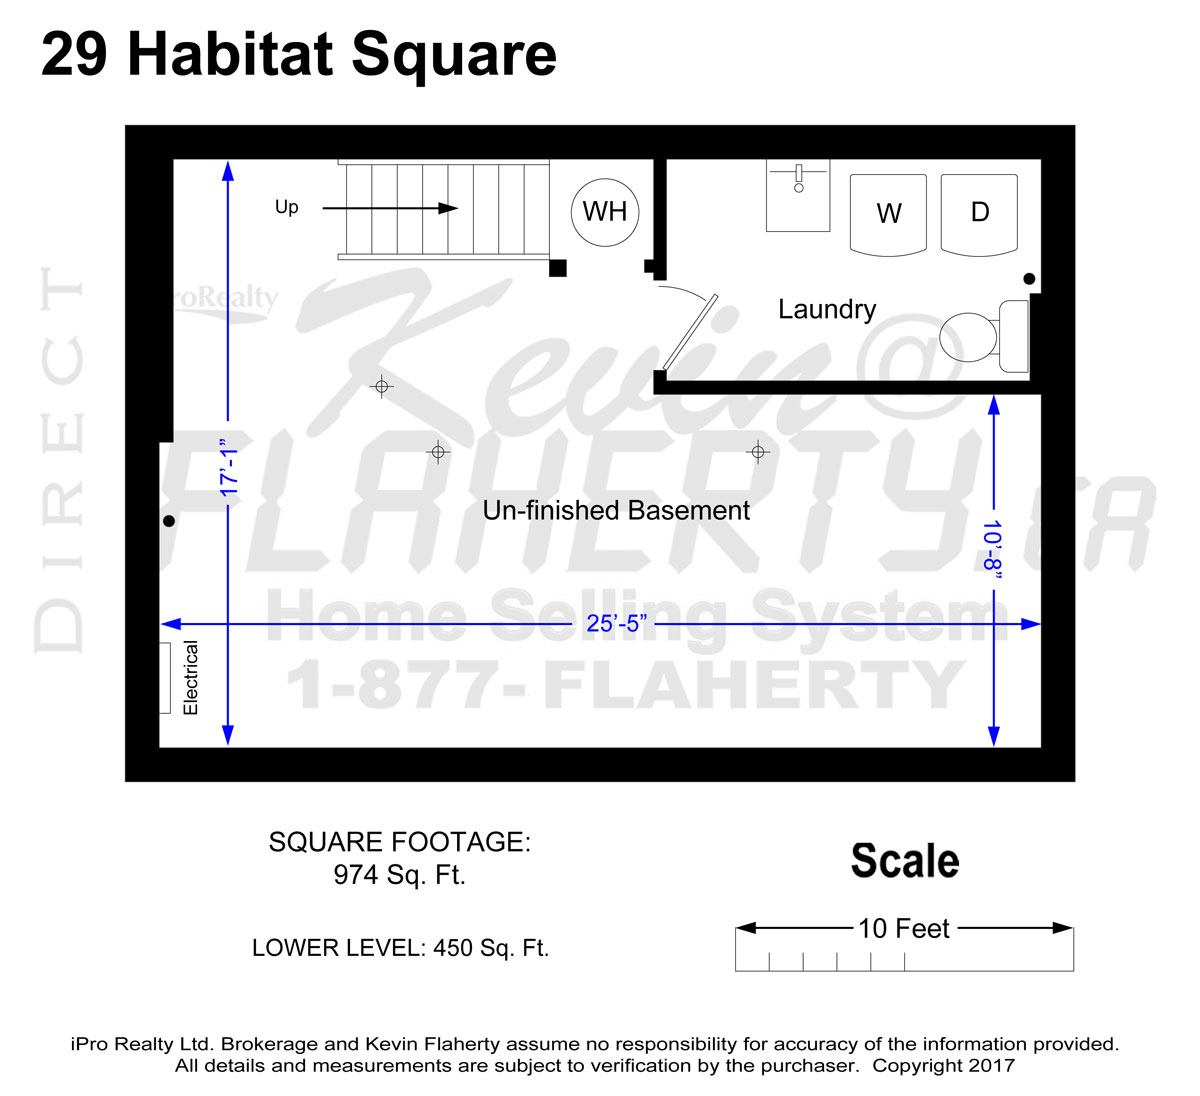 29 Habitat Sq Brampton Real Estate Listing